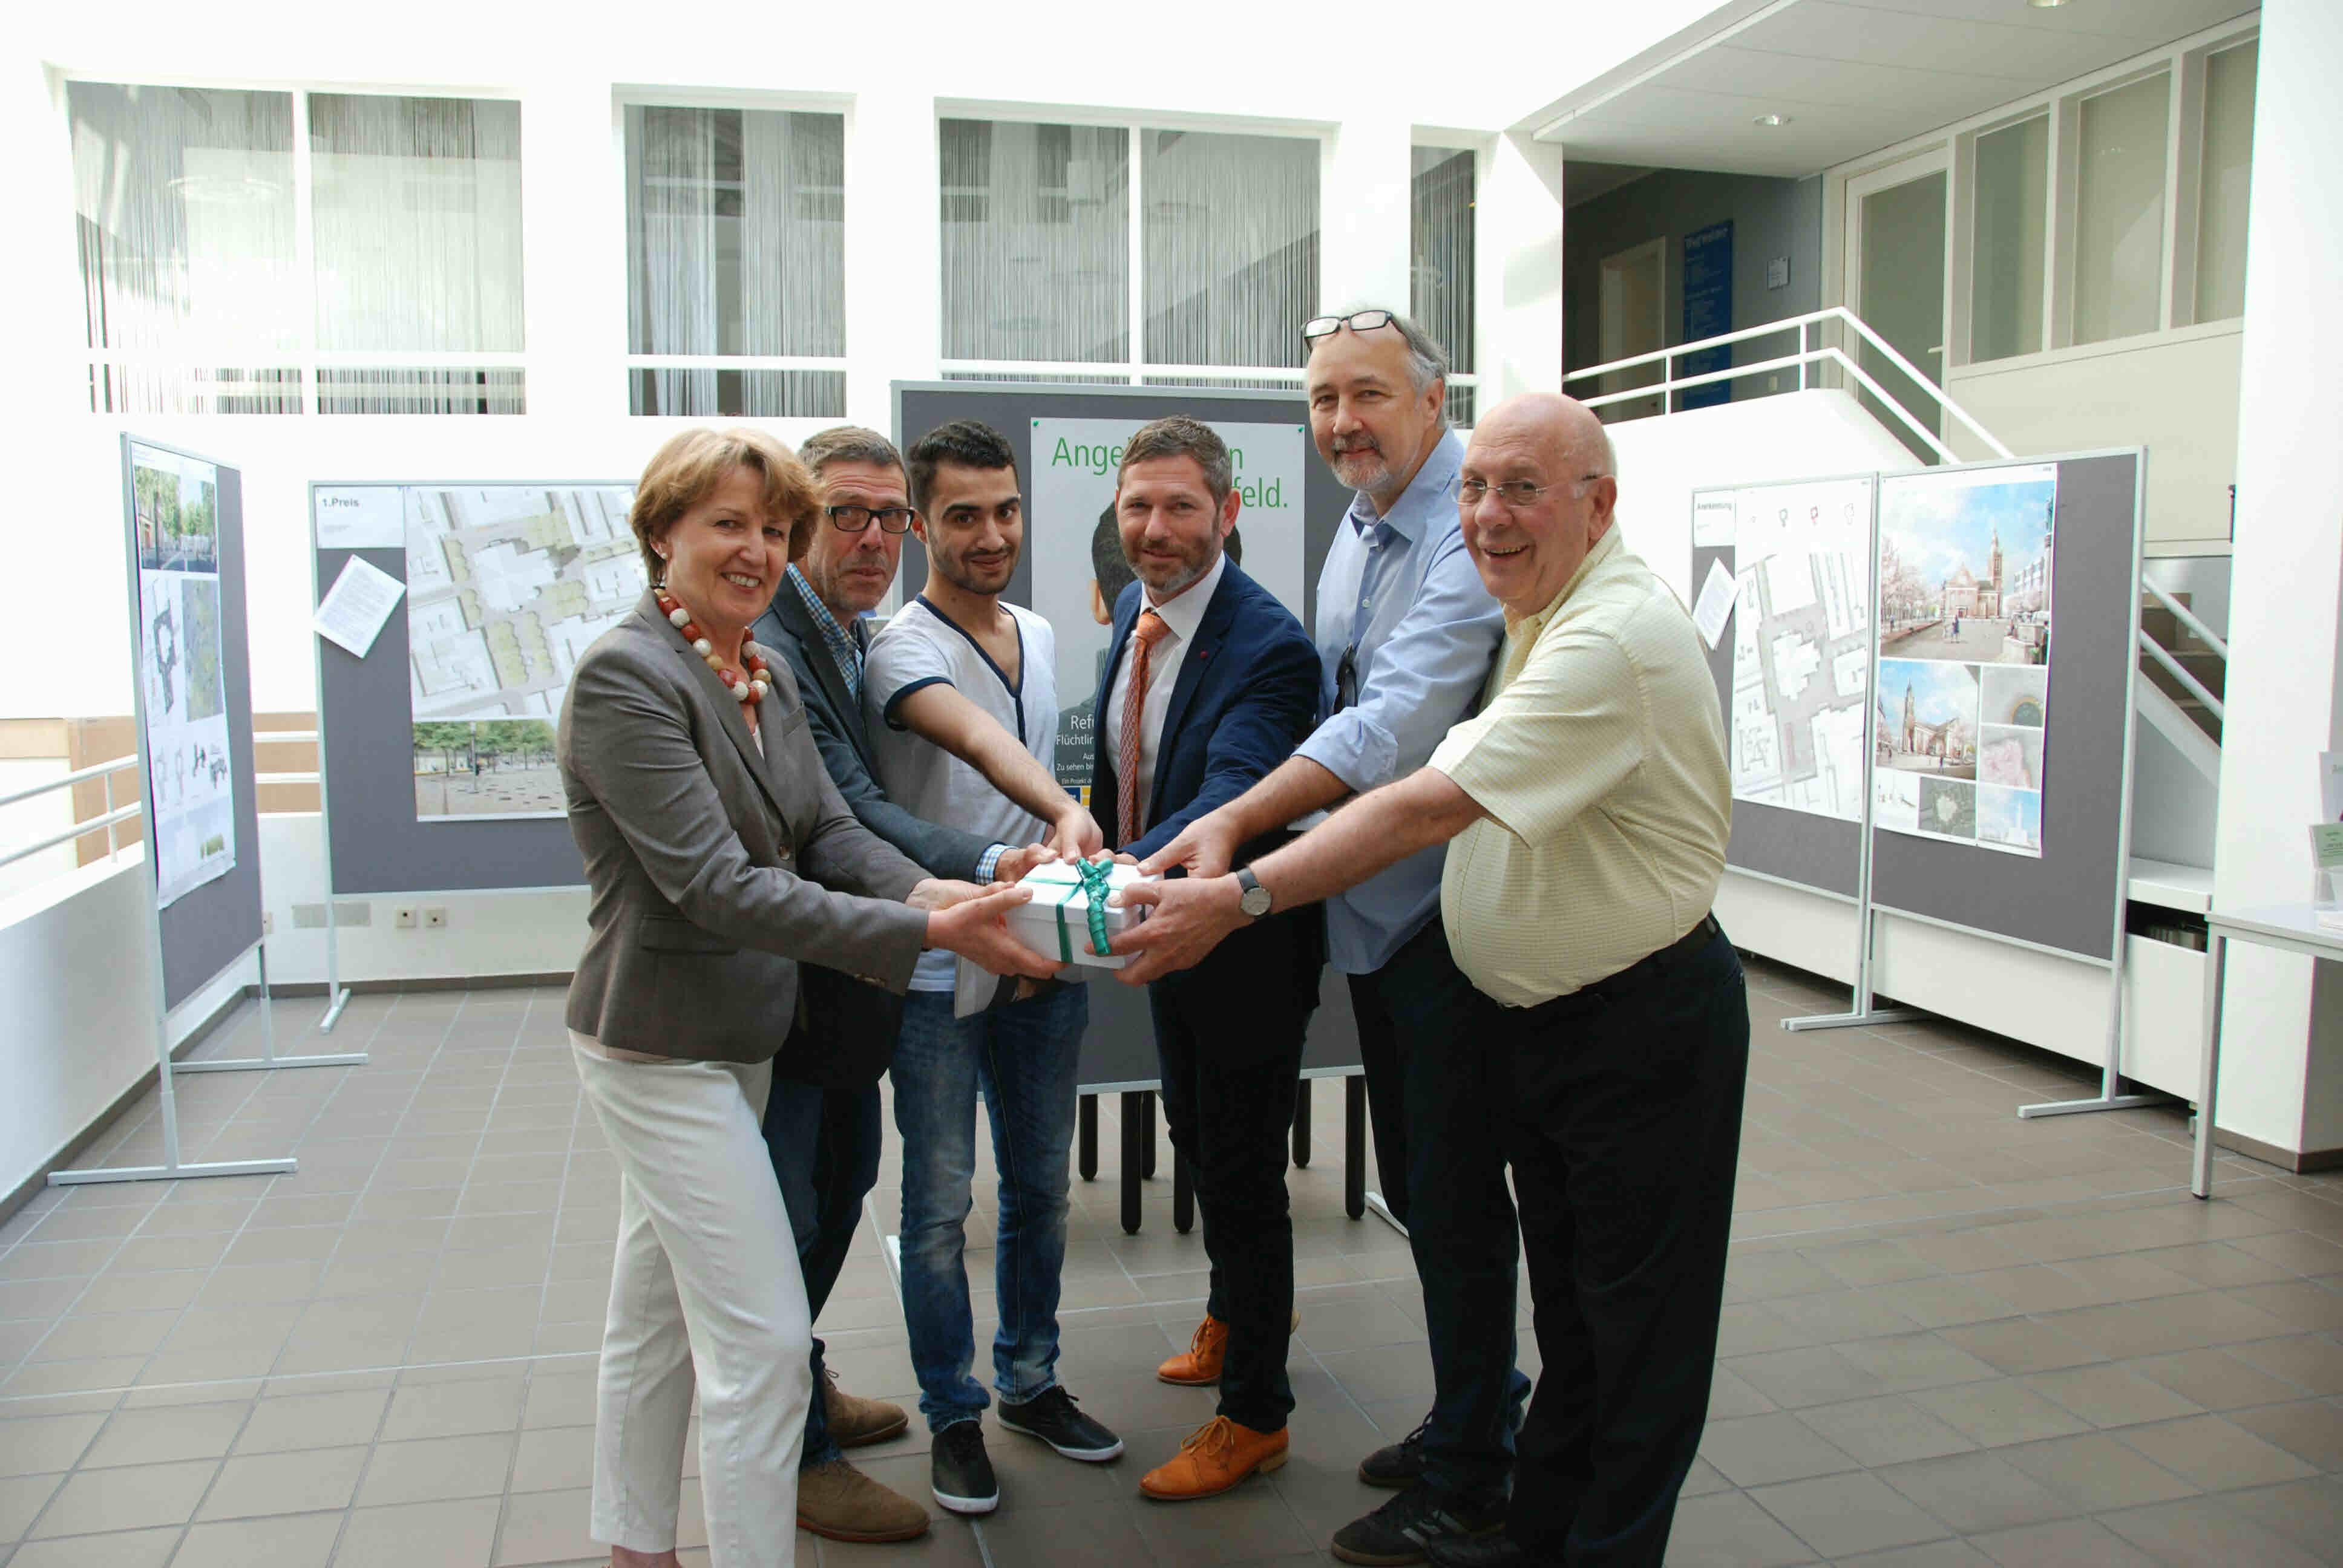 Dr. Inge Röhnelt, Paul Maaßen, Ammar Alhomada, Michael Passon, Joachim Watzlawik und Josef Schwalbach (Foto: Stadt Krefeld)